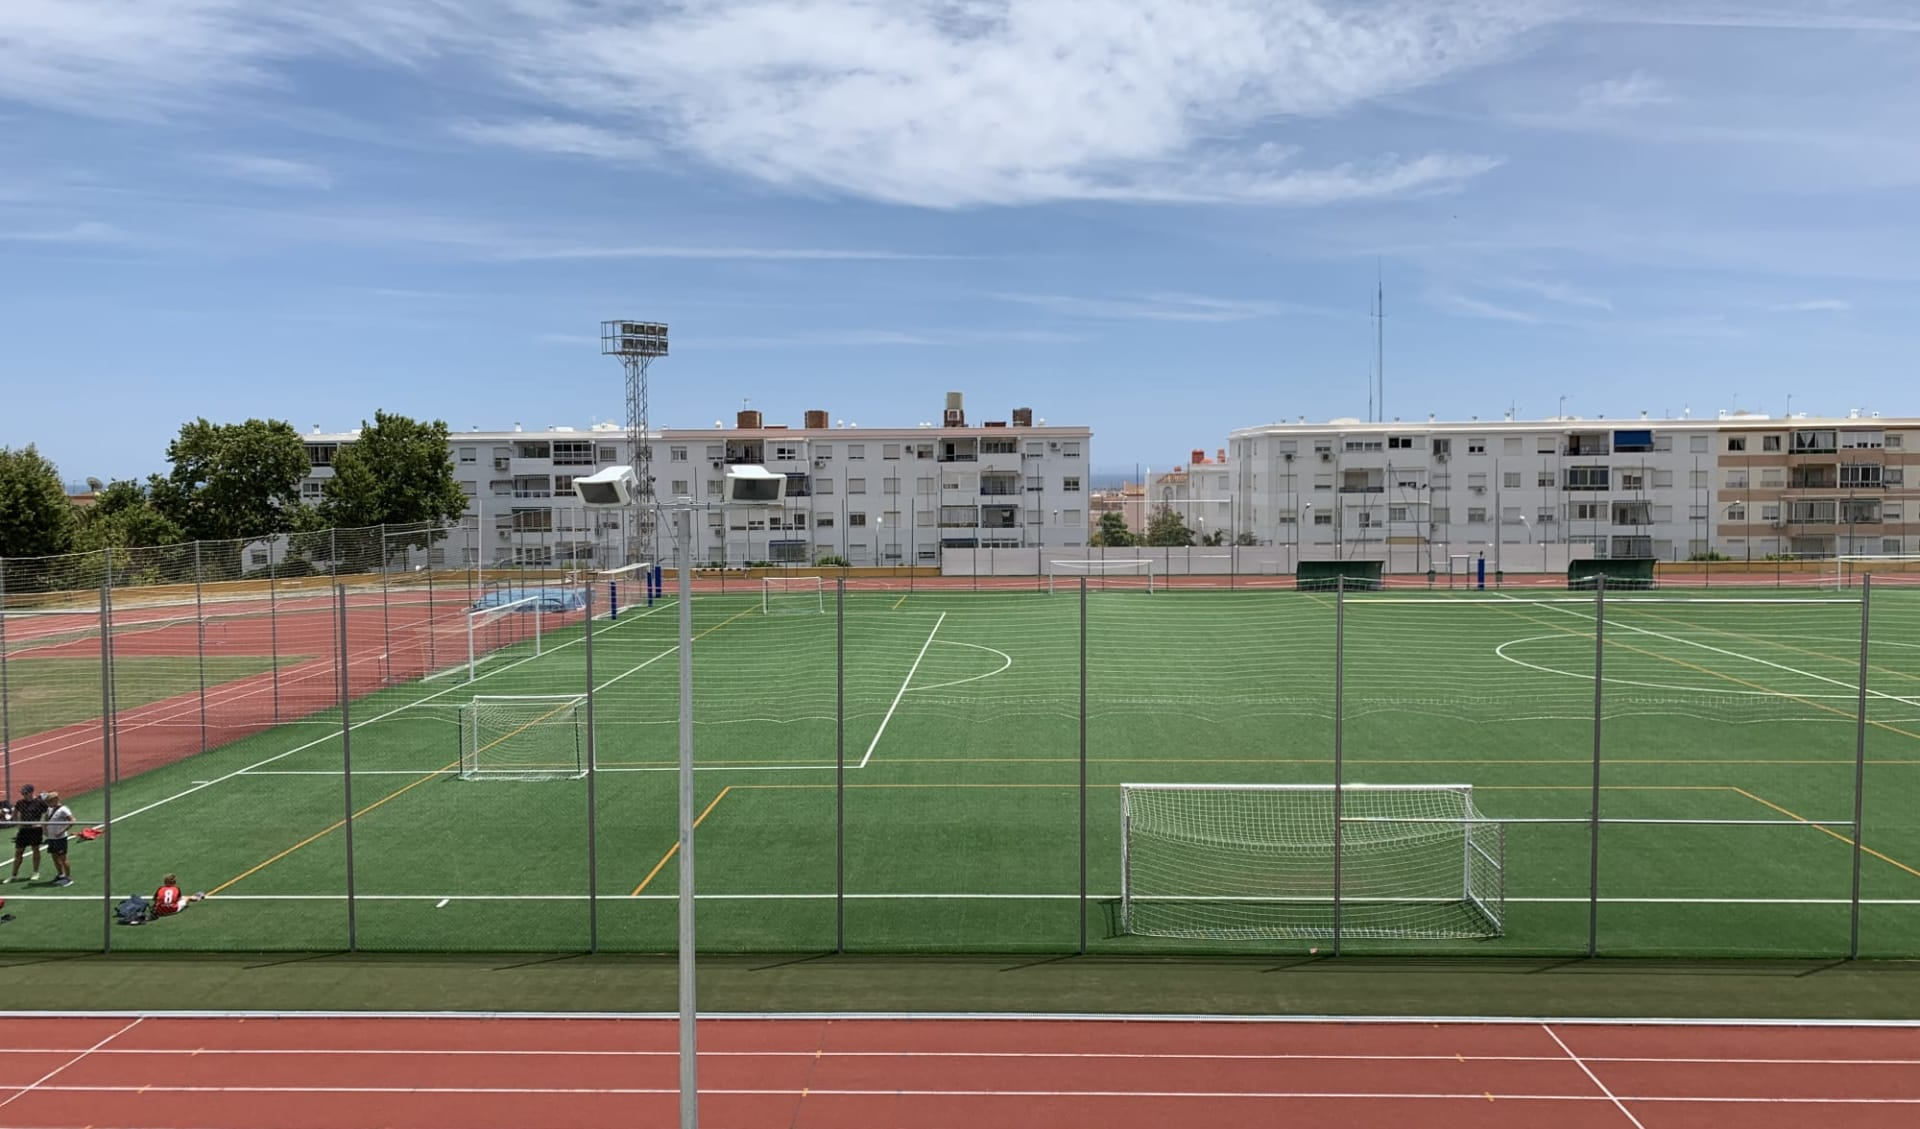 Malaga - Hotel Alay: A1 Benalmadena Kunstrasen 1